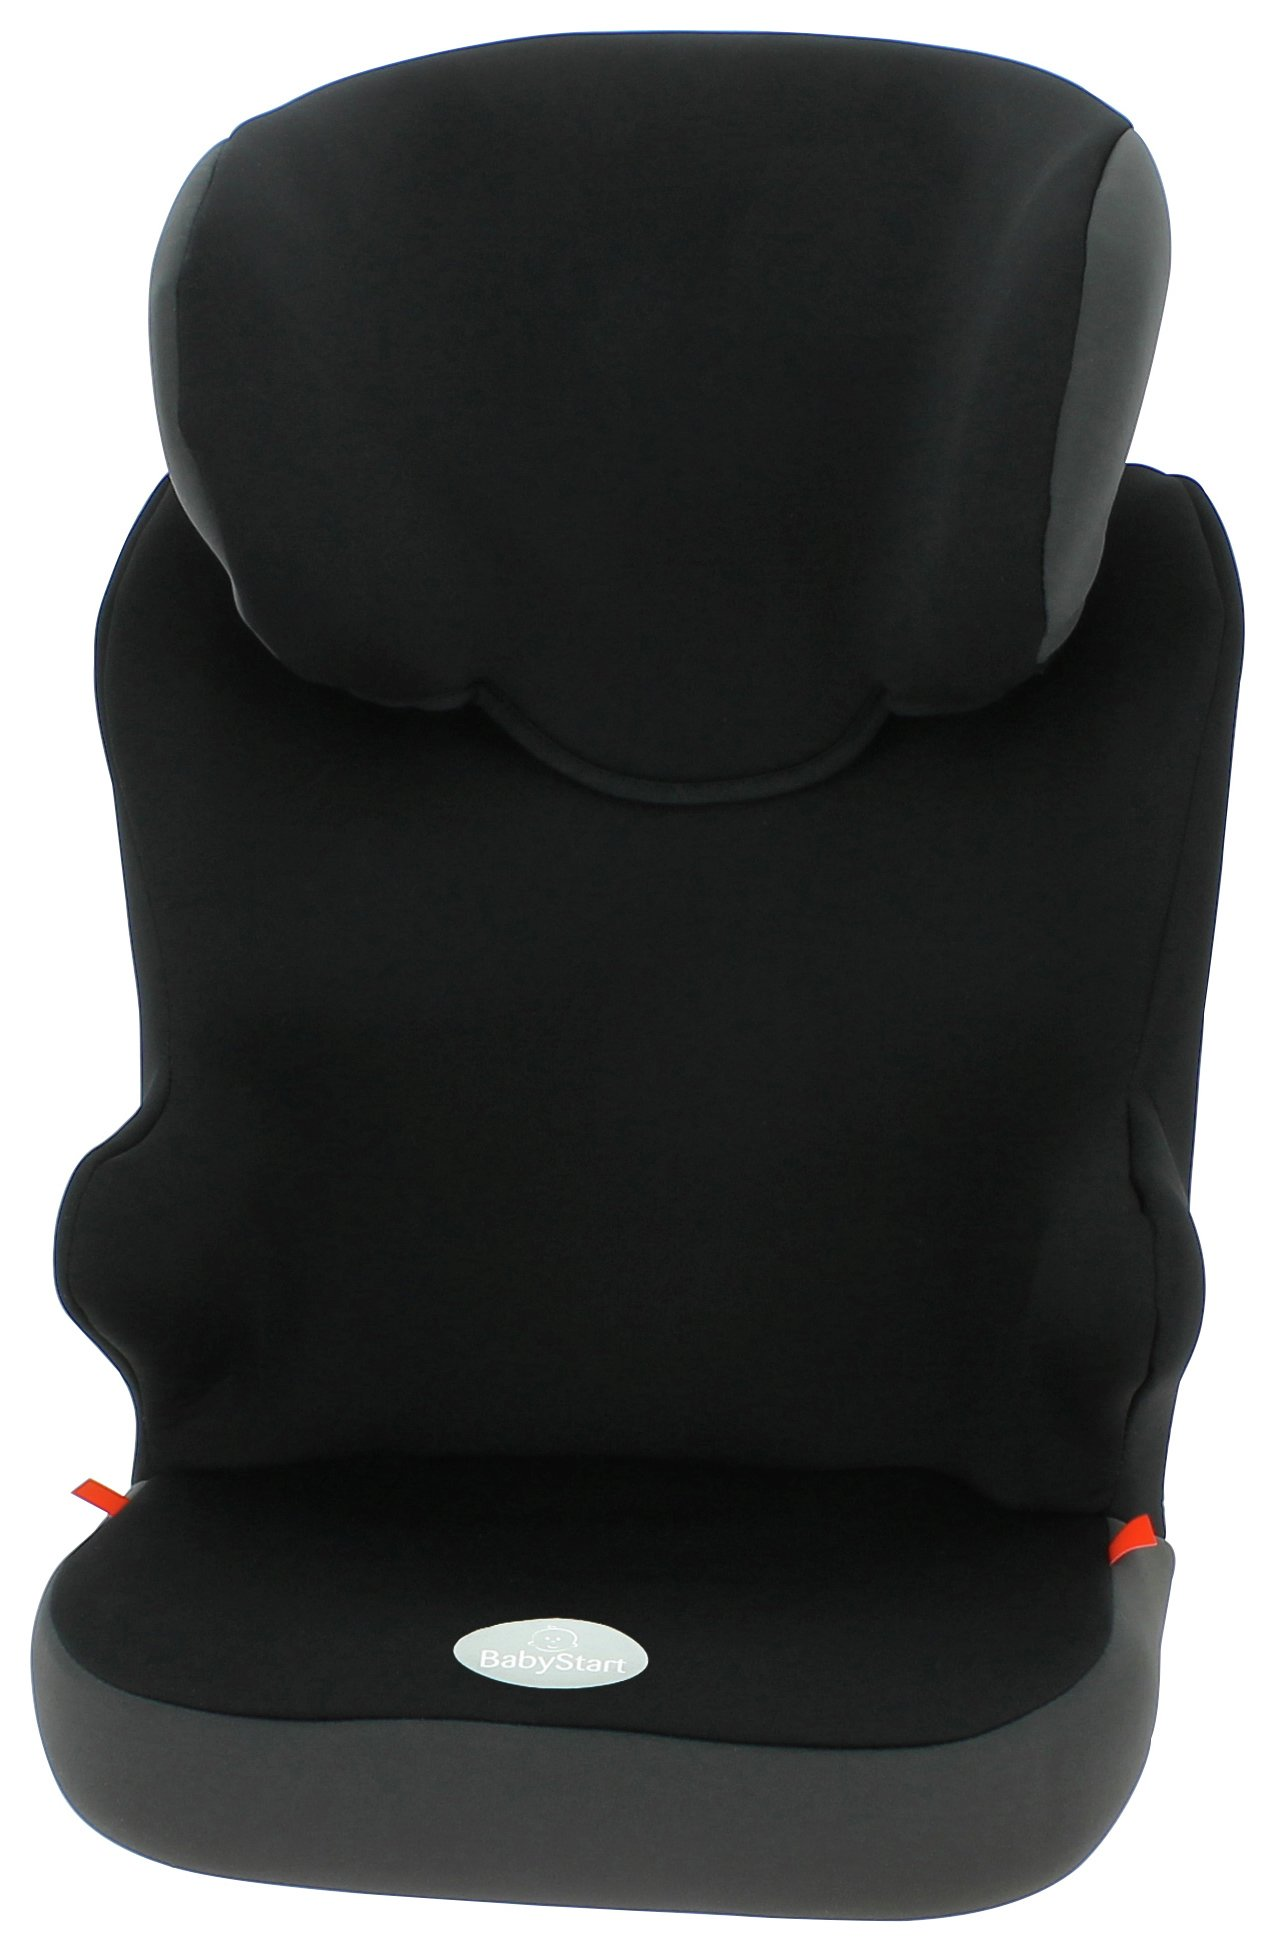 Image of BabyStart Starter Group 2-3 Black Car Seat